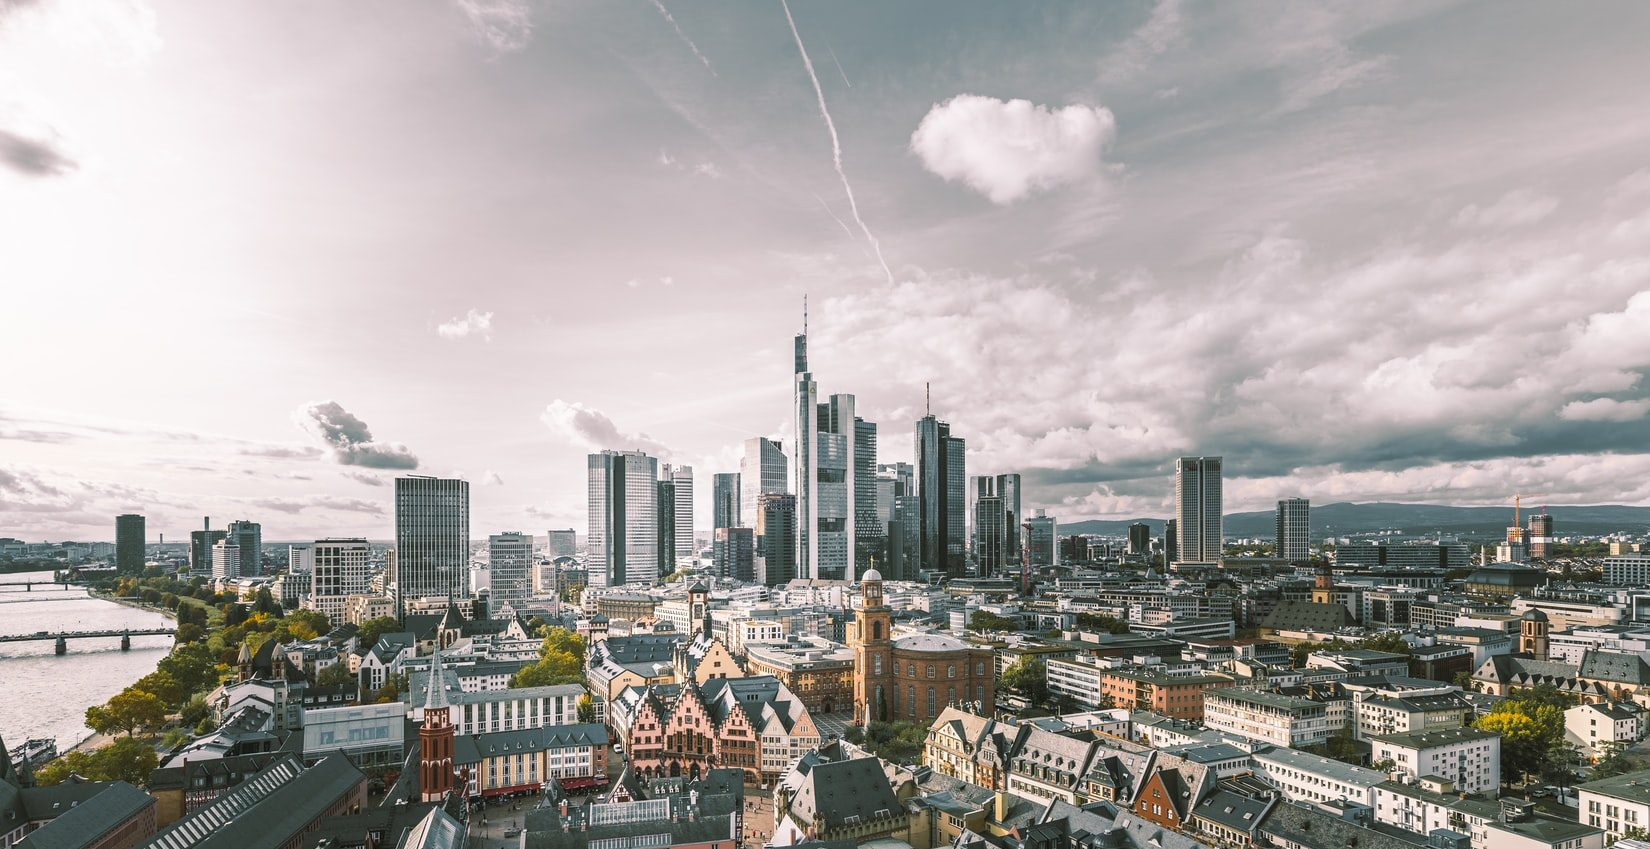 Frankfurt ist als Bankenhauptstadt ein beliebter Standort